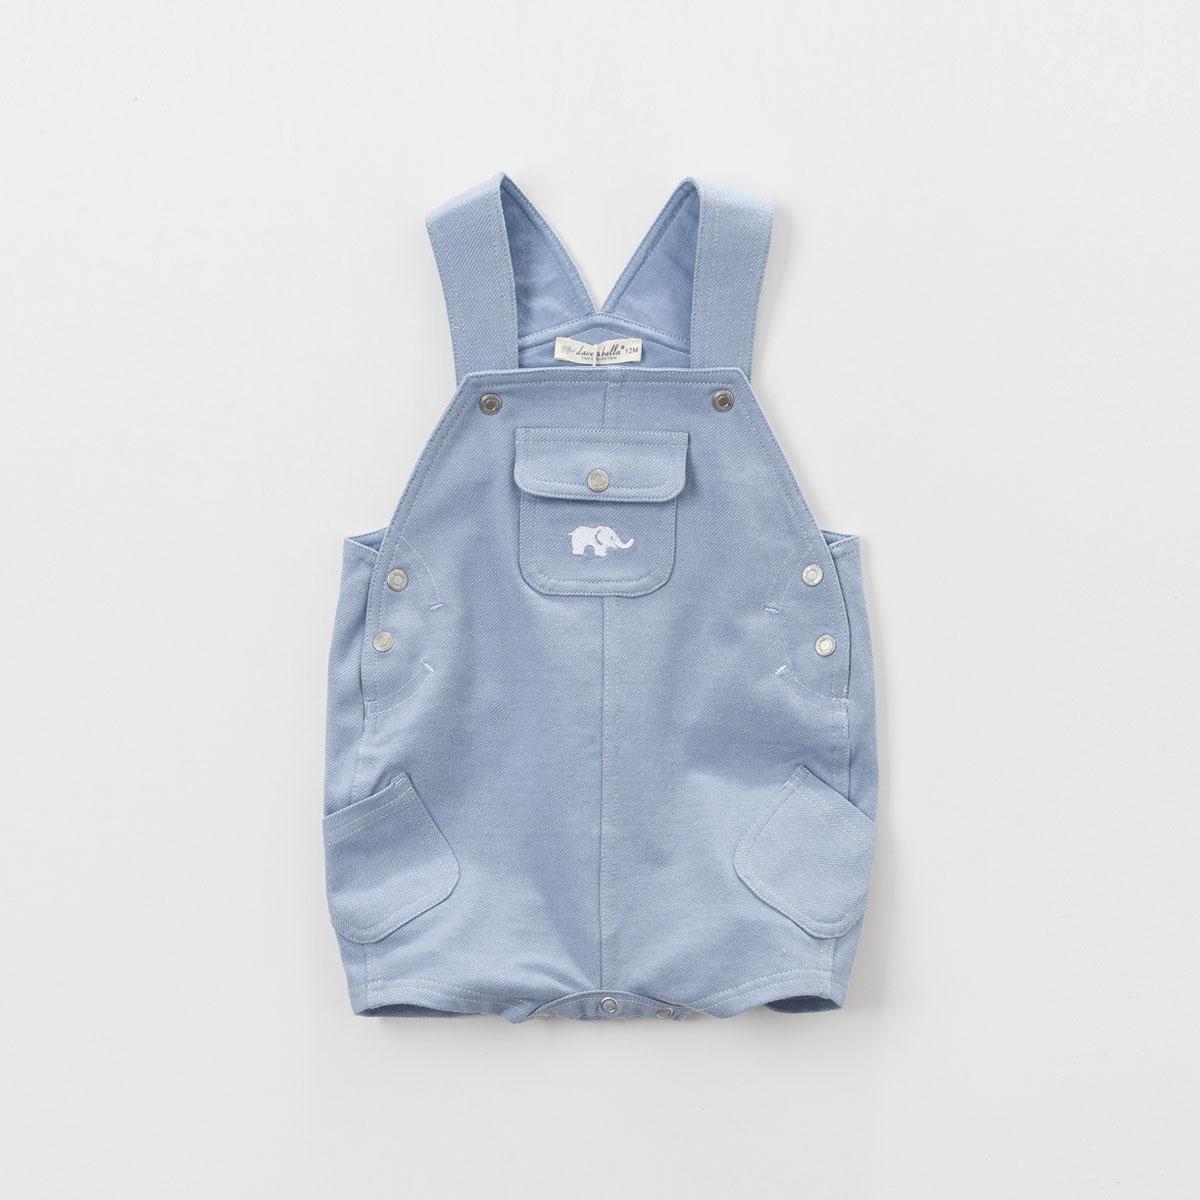 davebella戴維貝拉 男童夏裝 背帶短褲 男寶寶褲子 嬰兒背帶褲